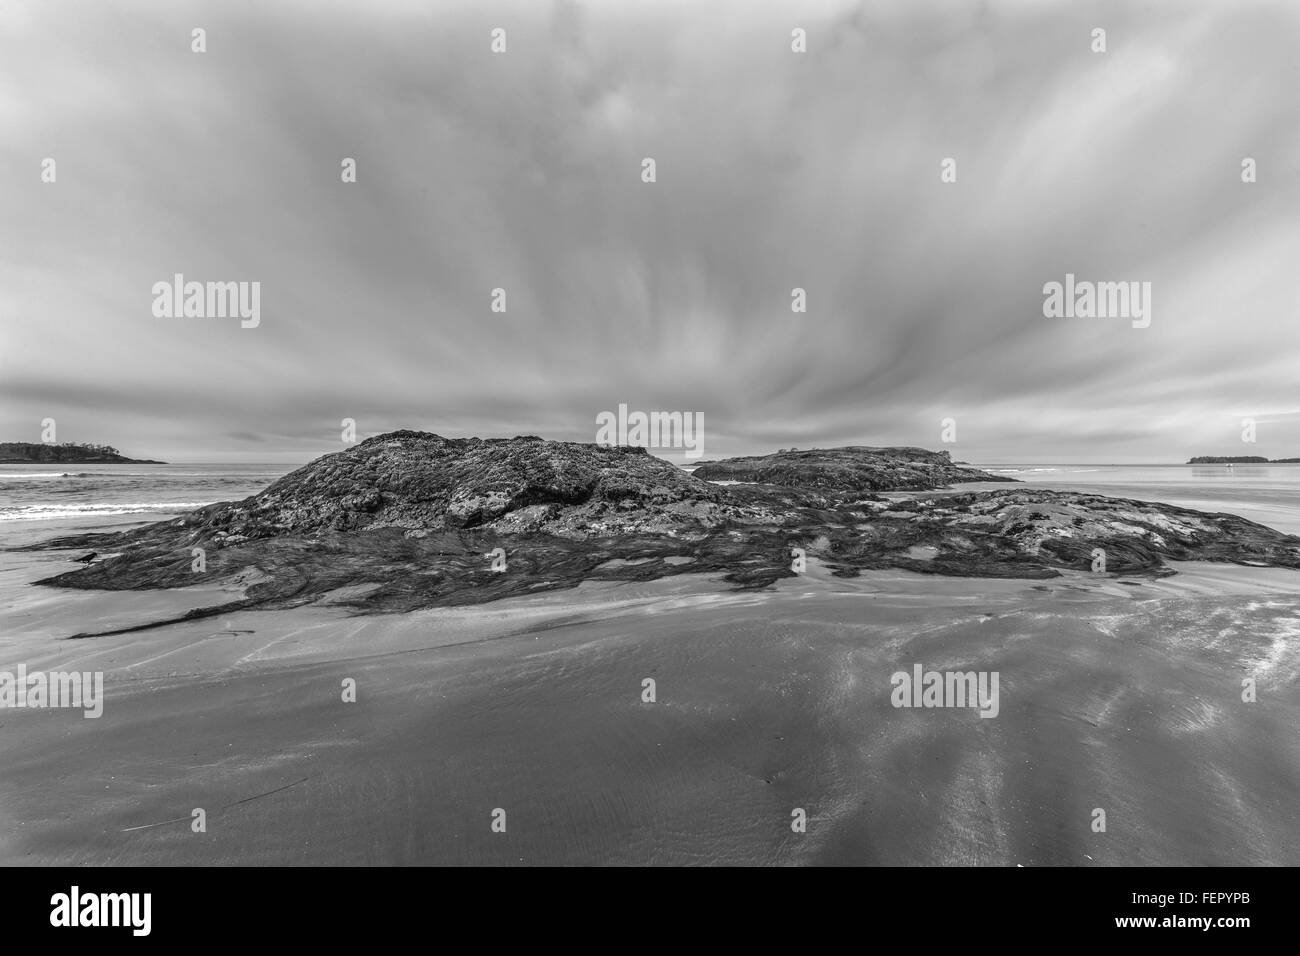 Low tide with raven, BW, Chesterman Beach, Tofino, British Columbia Stock Photo